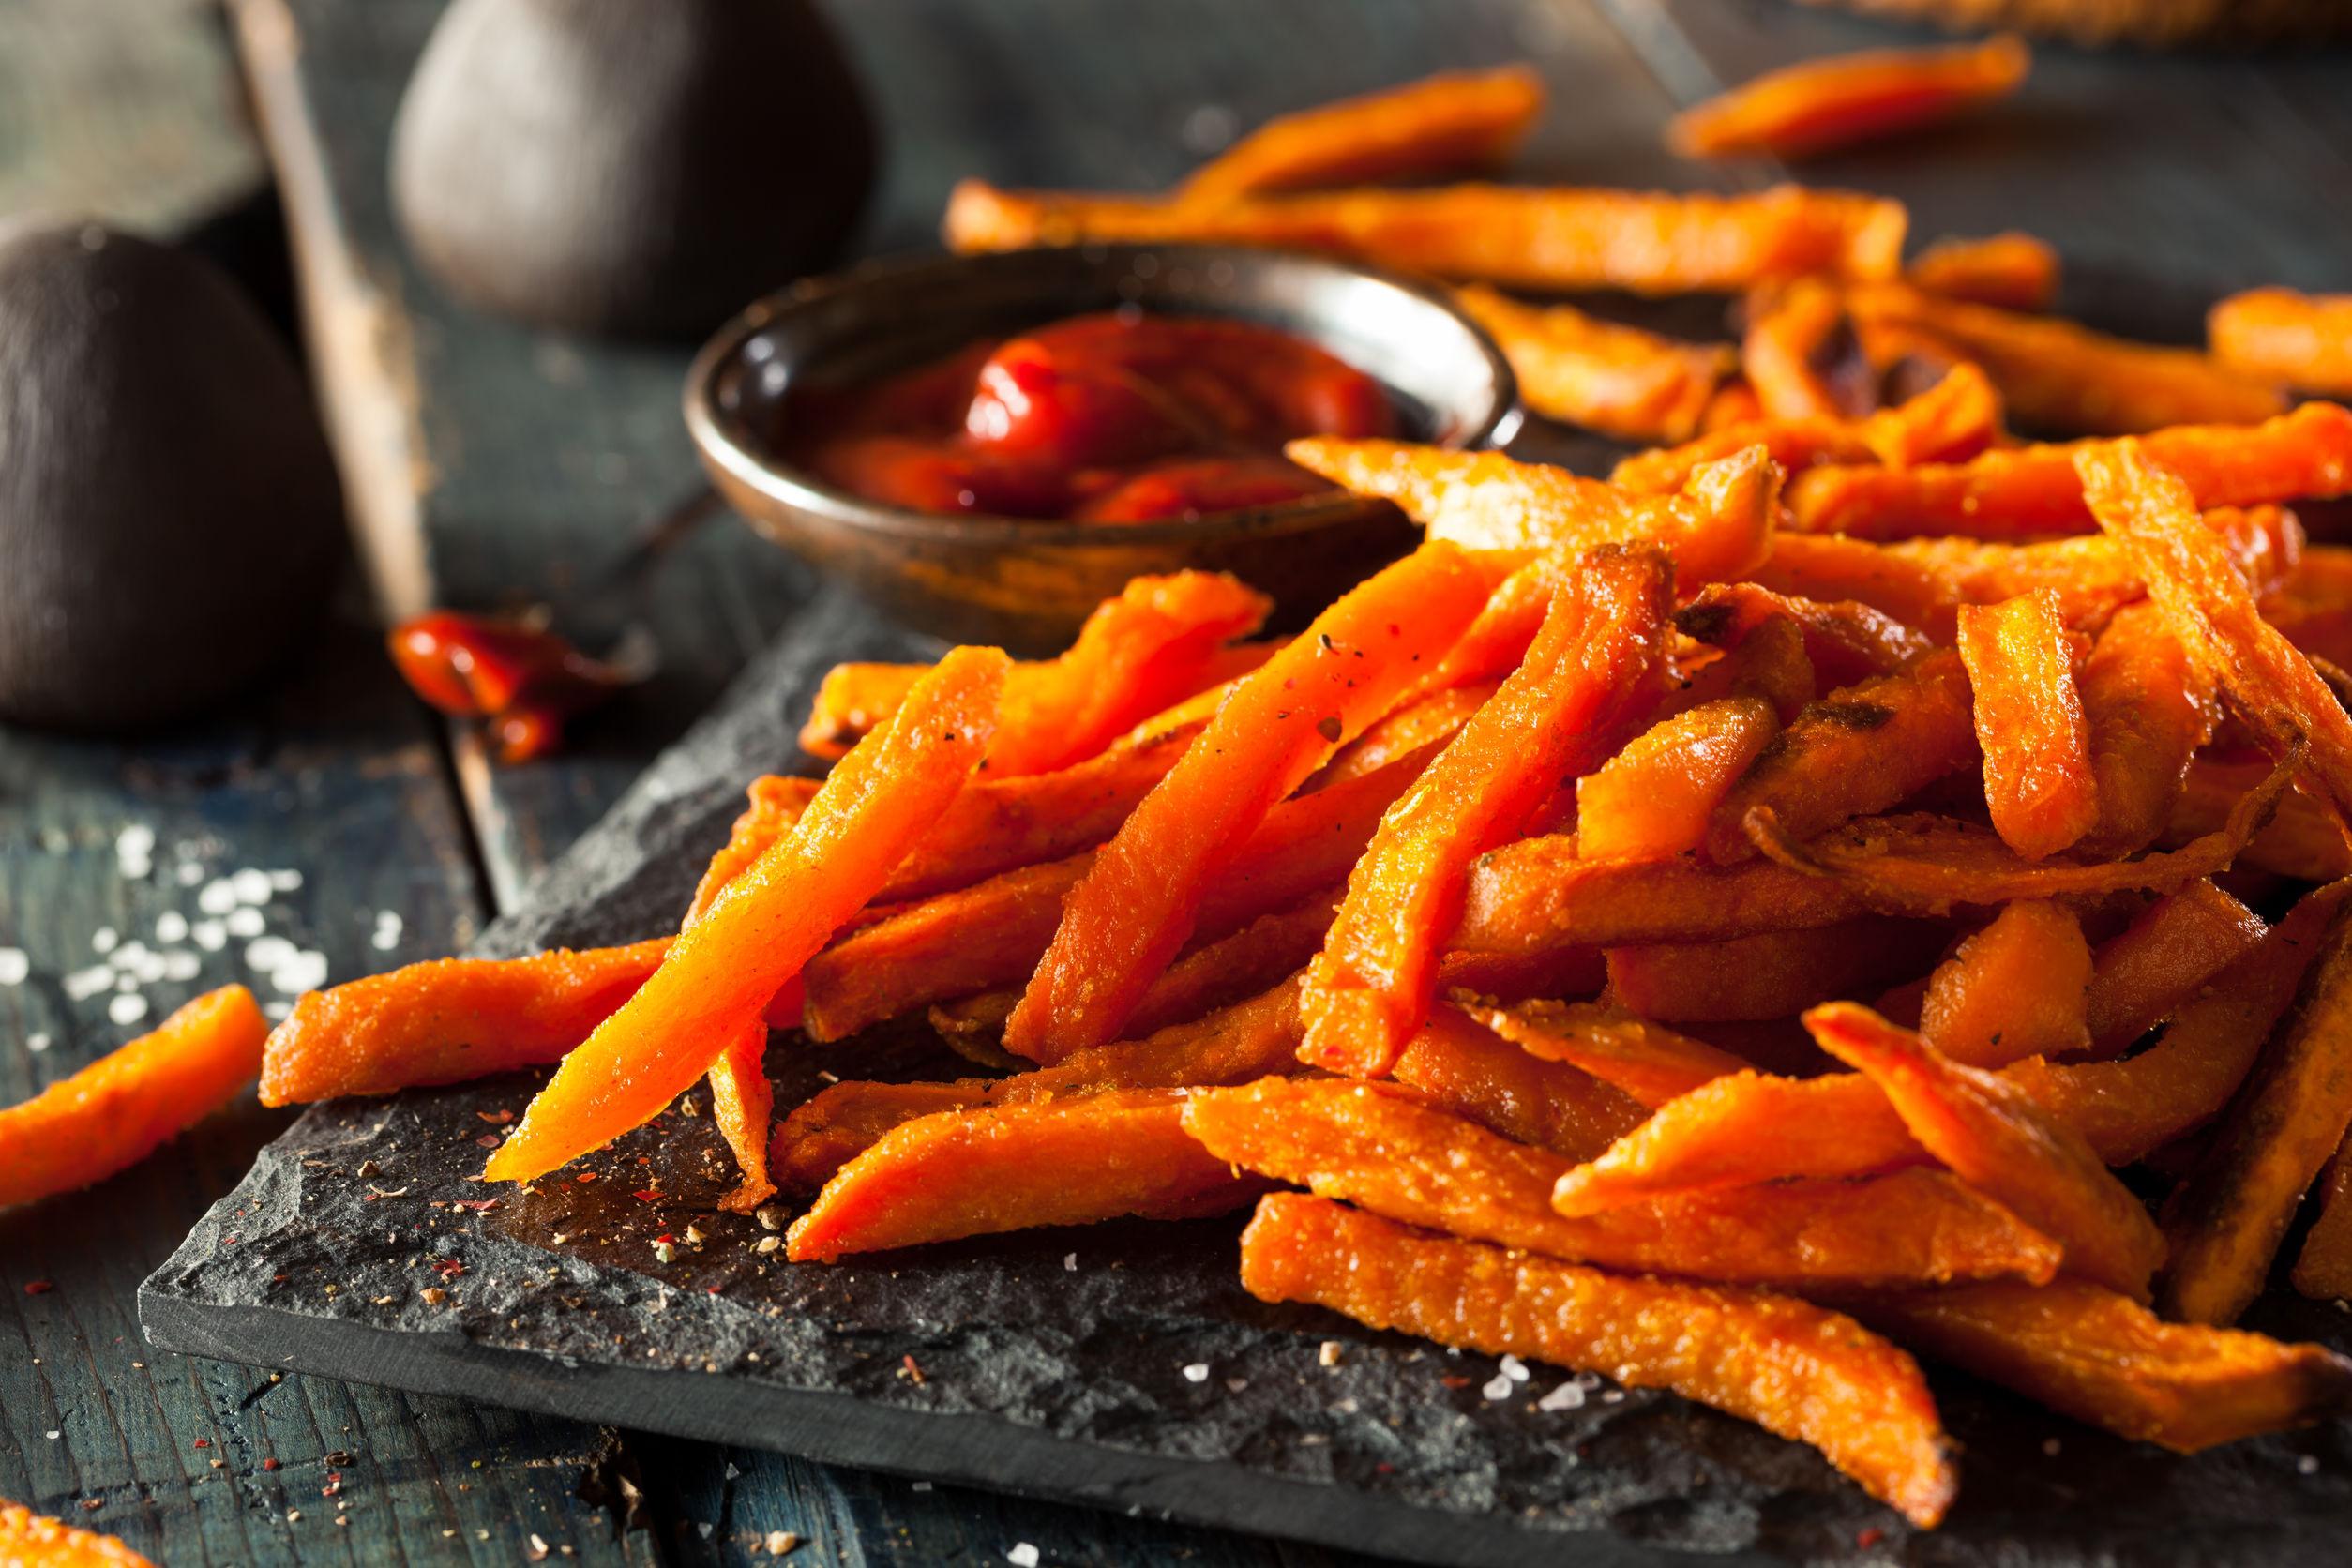 41012043 - homemade orange sweet potato fries with salt and pepper